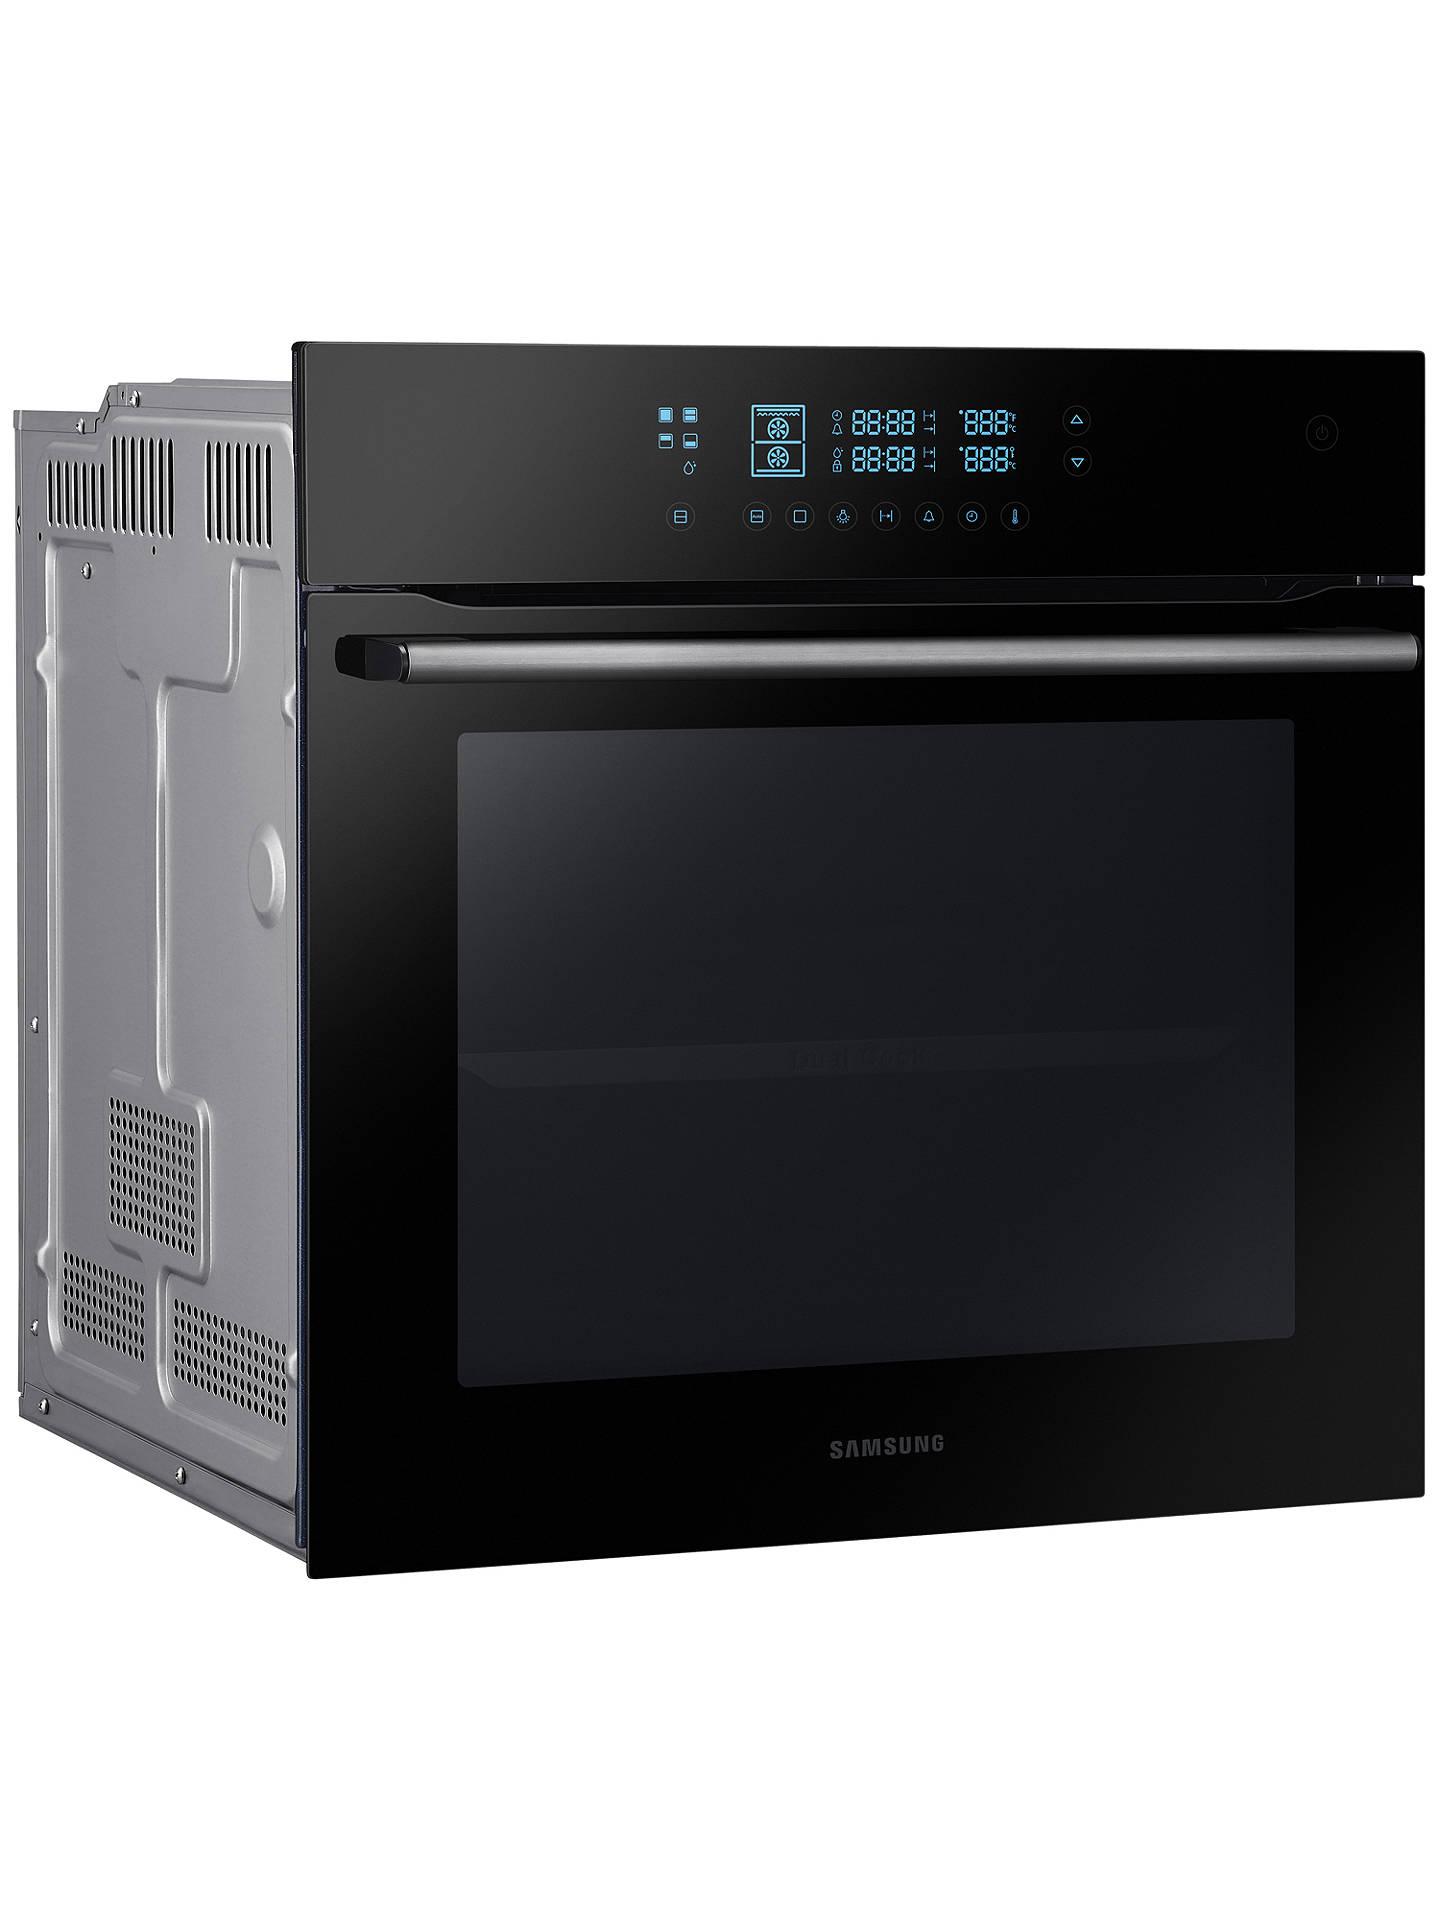 samsung bq2q7g078 dual cook electric single oven black. Black Bedroom Furniture Sets. Home Design Ideas